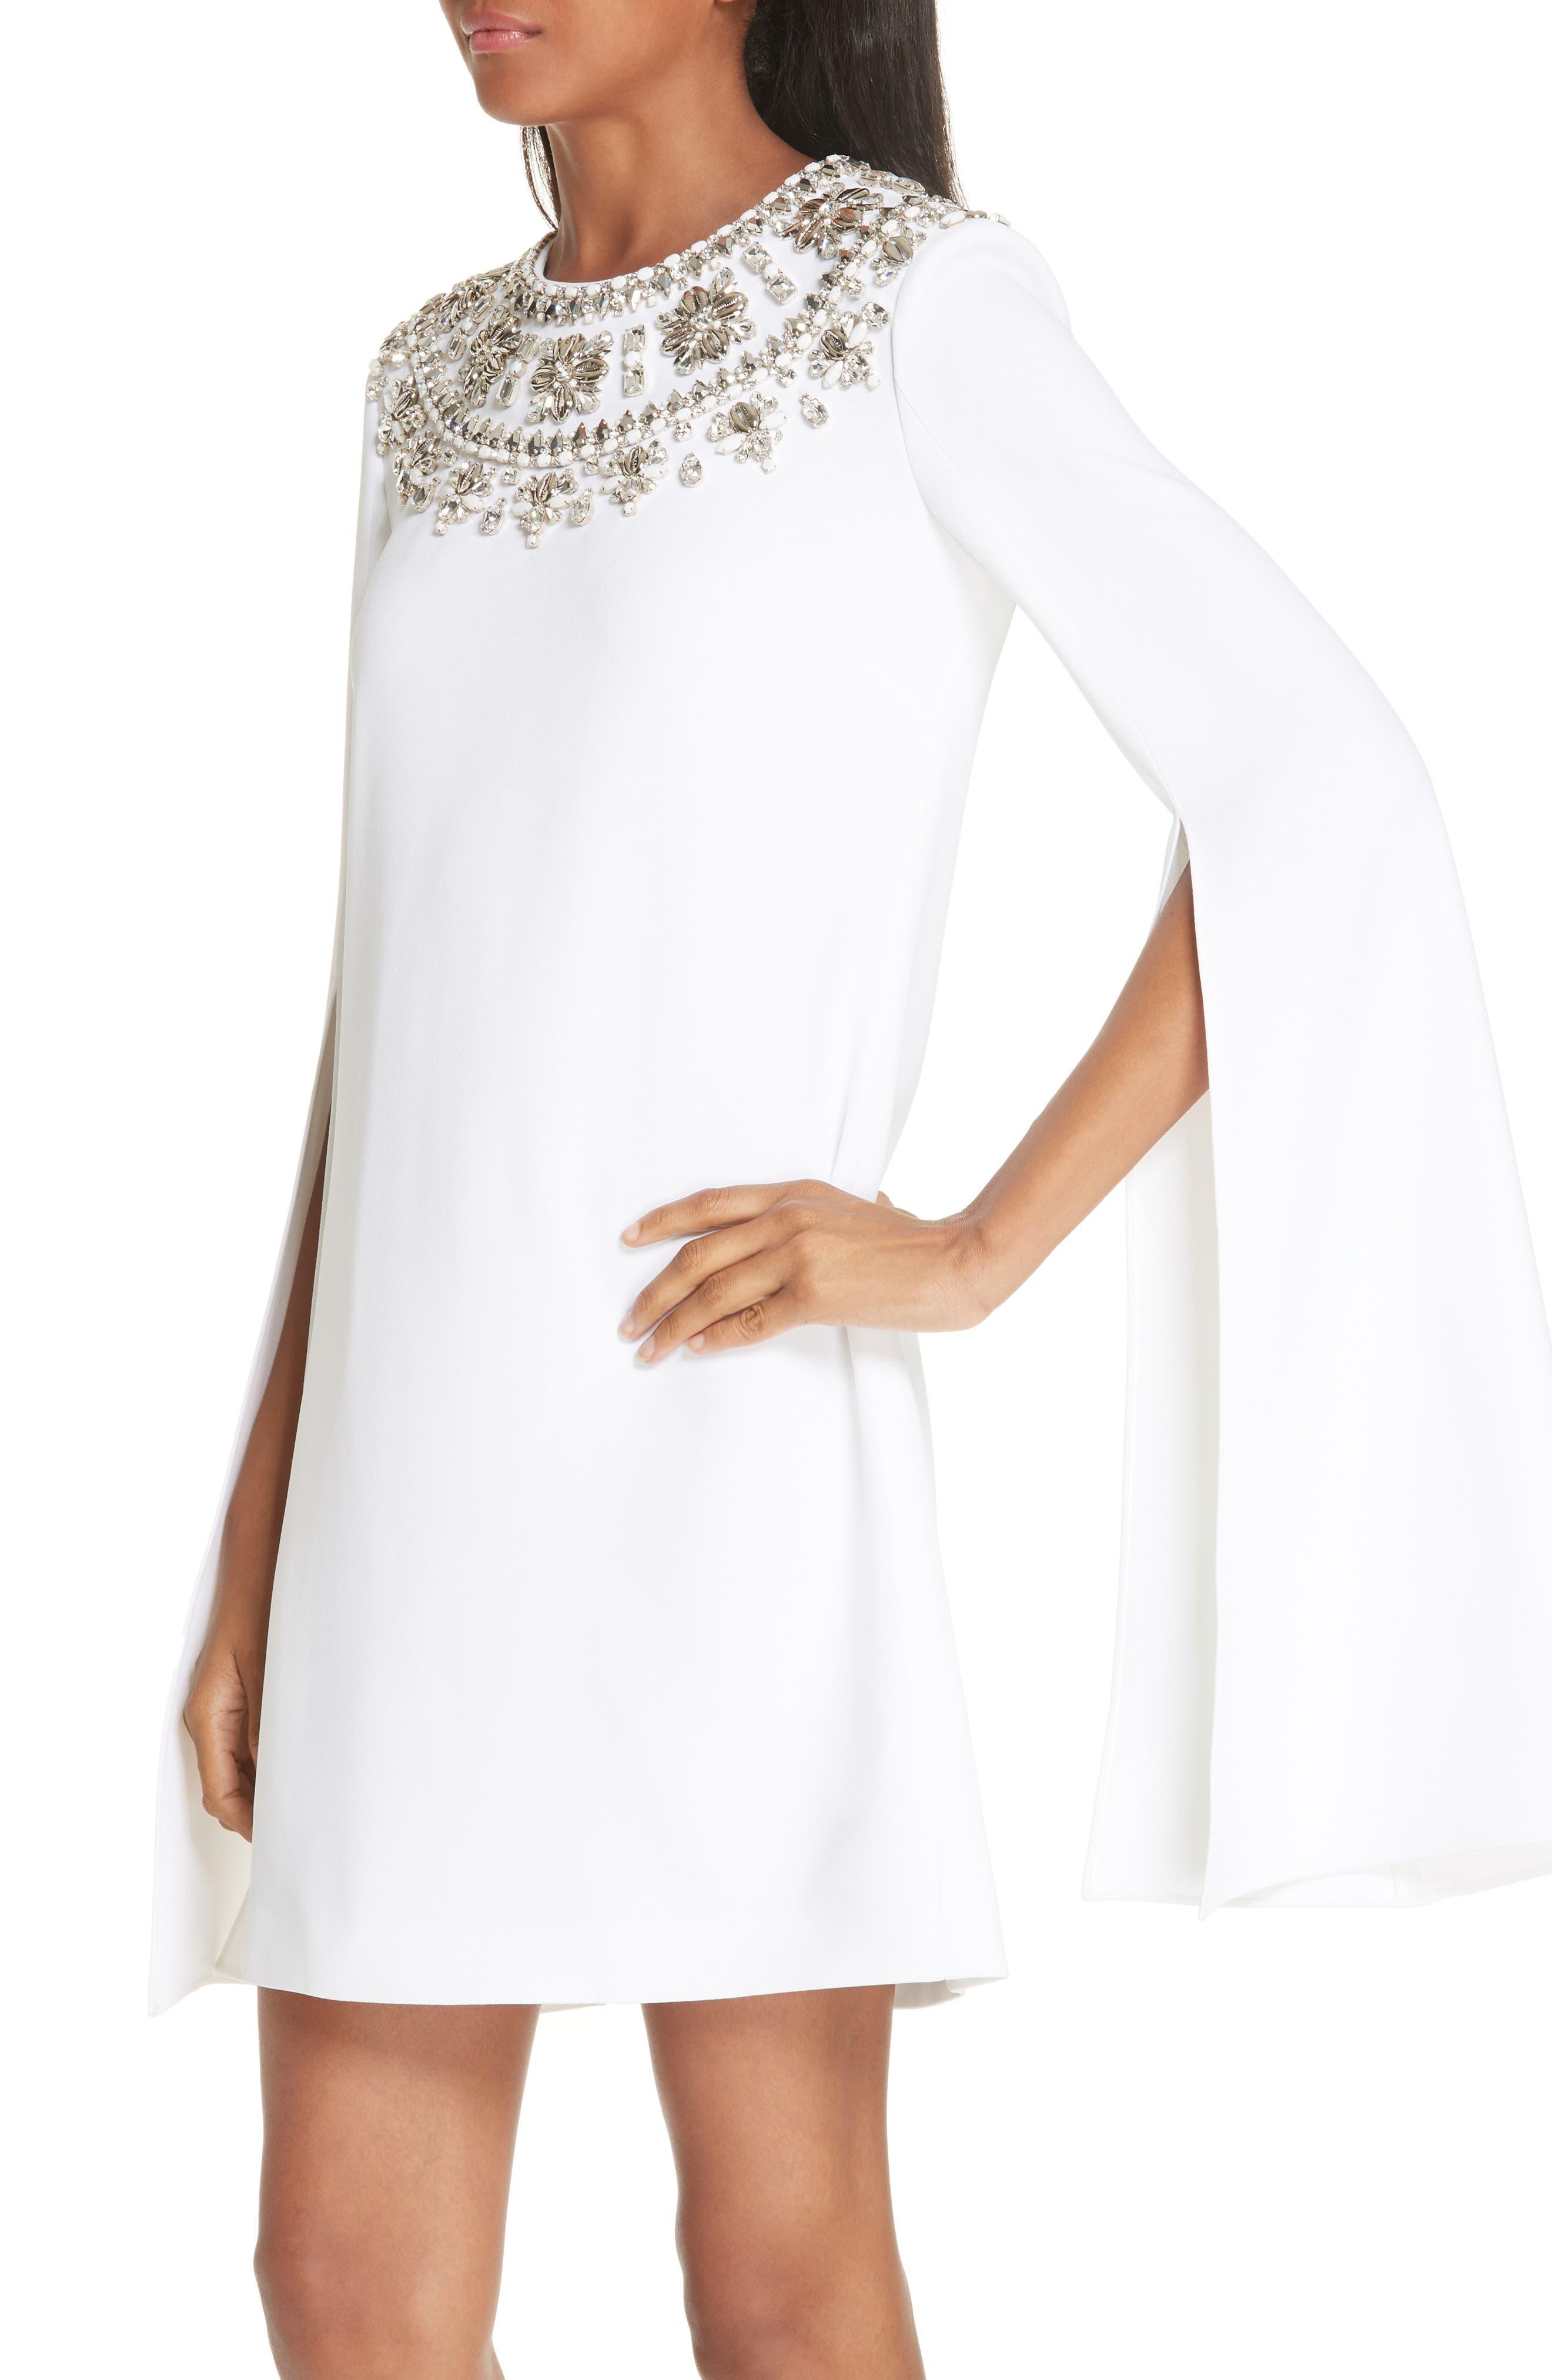 MICHAEL KORS, Crystal Embellished Split Sleeve Double Crepe Sable Dress, Alternate thumbnail 5, color, OPTIC WHITE W/ SILVER